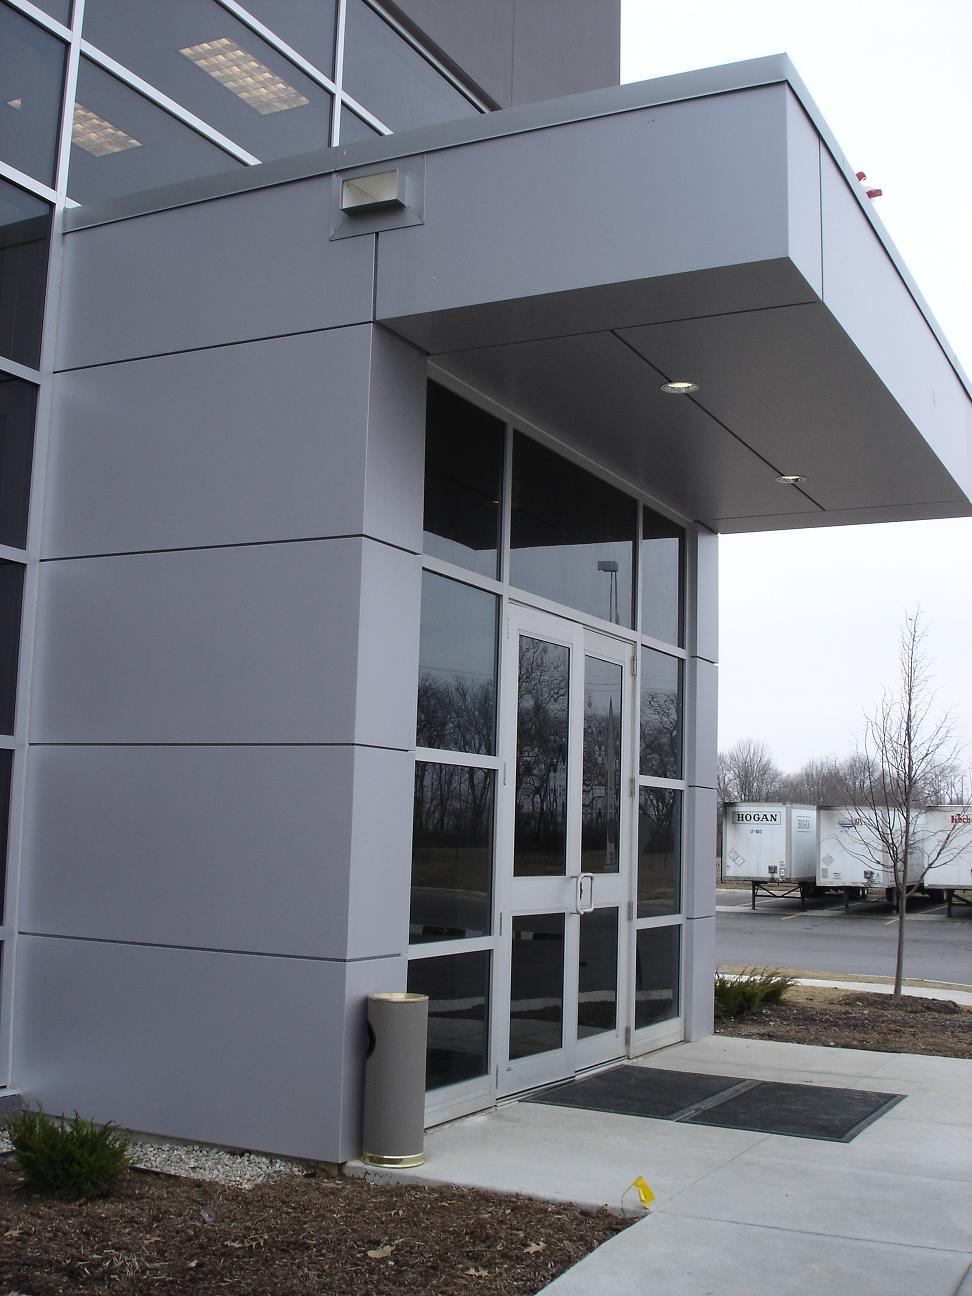 Whirlpool Saf Southern Aluminum Finishing Co Inc Saf